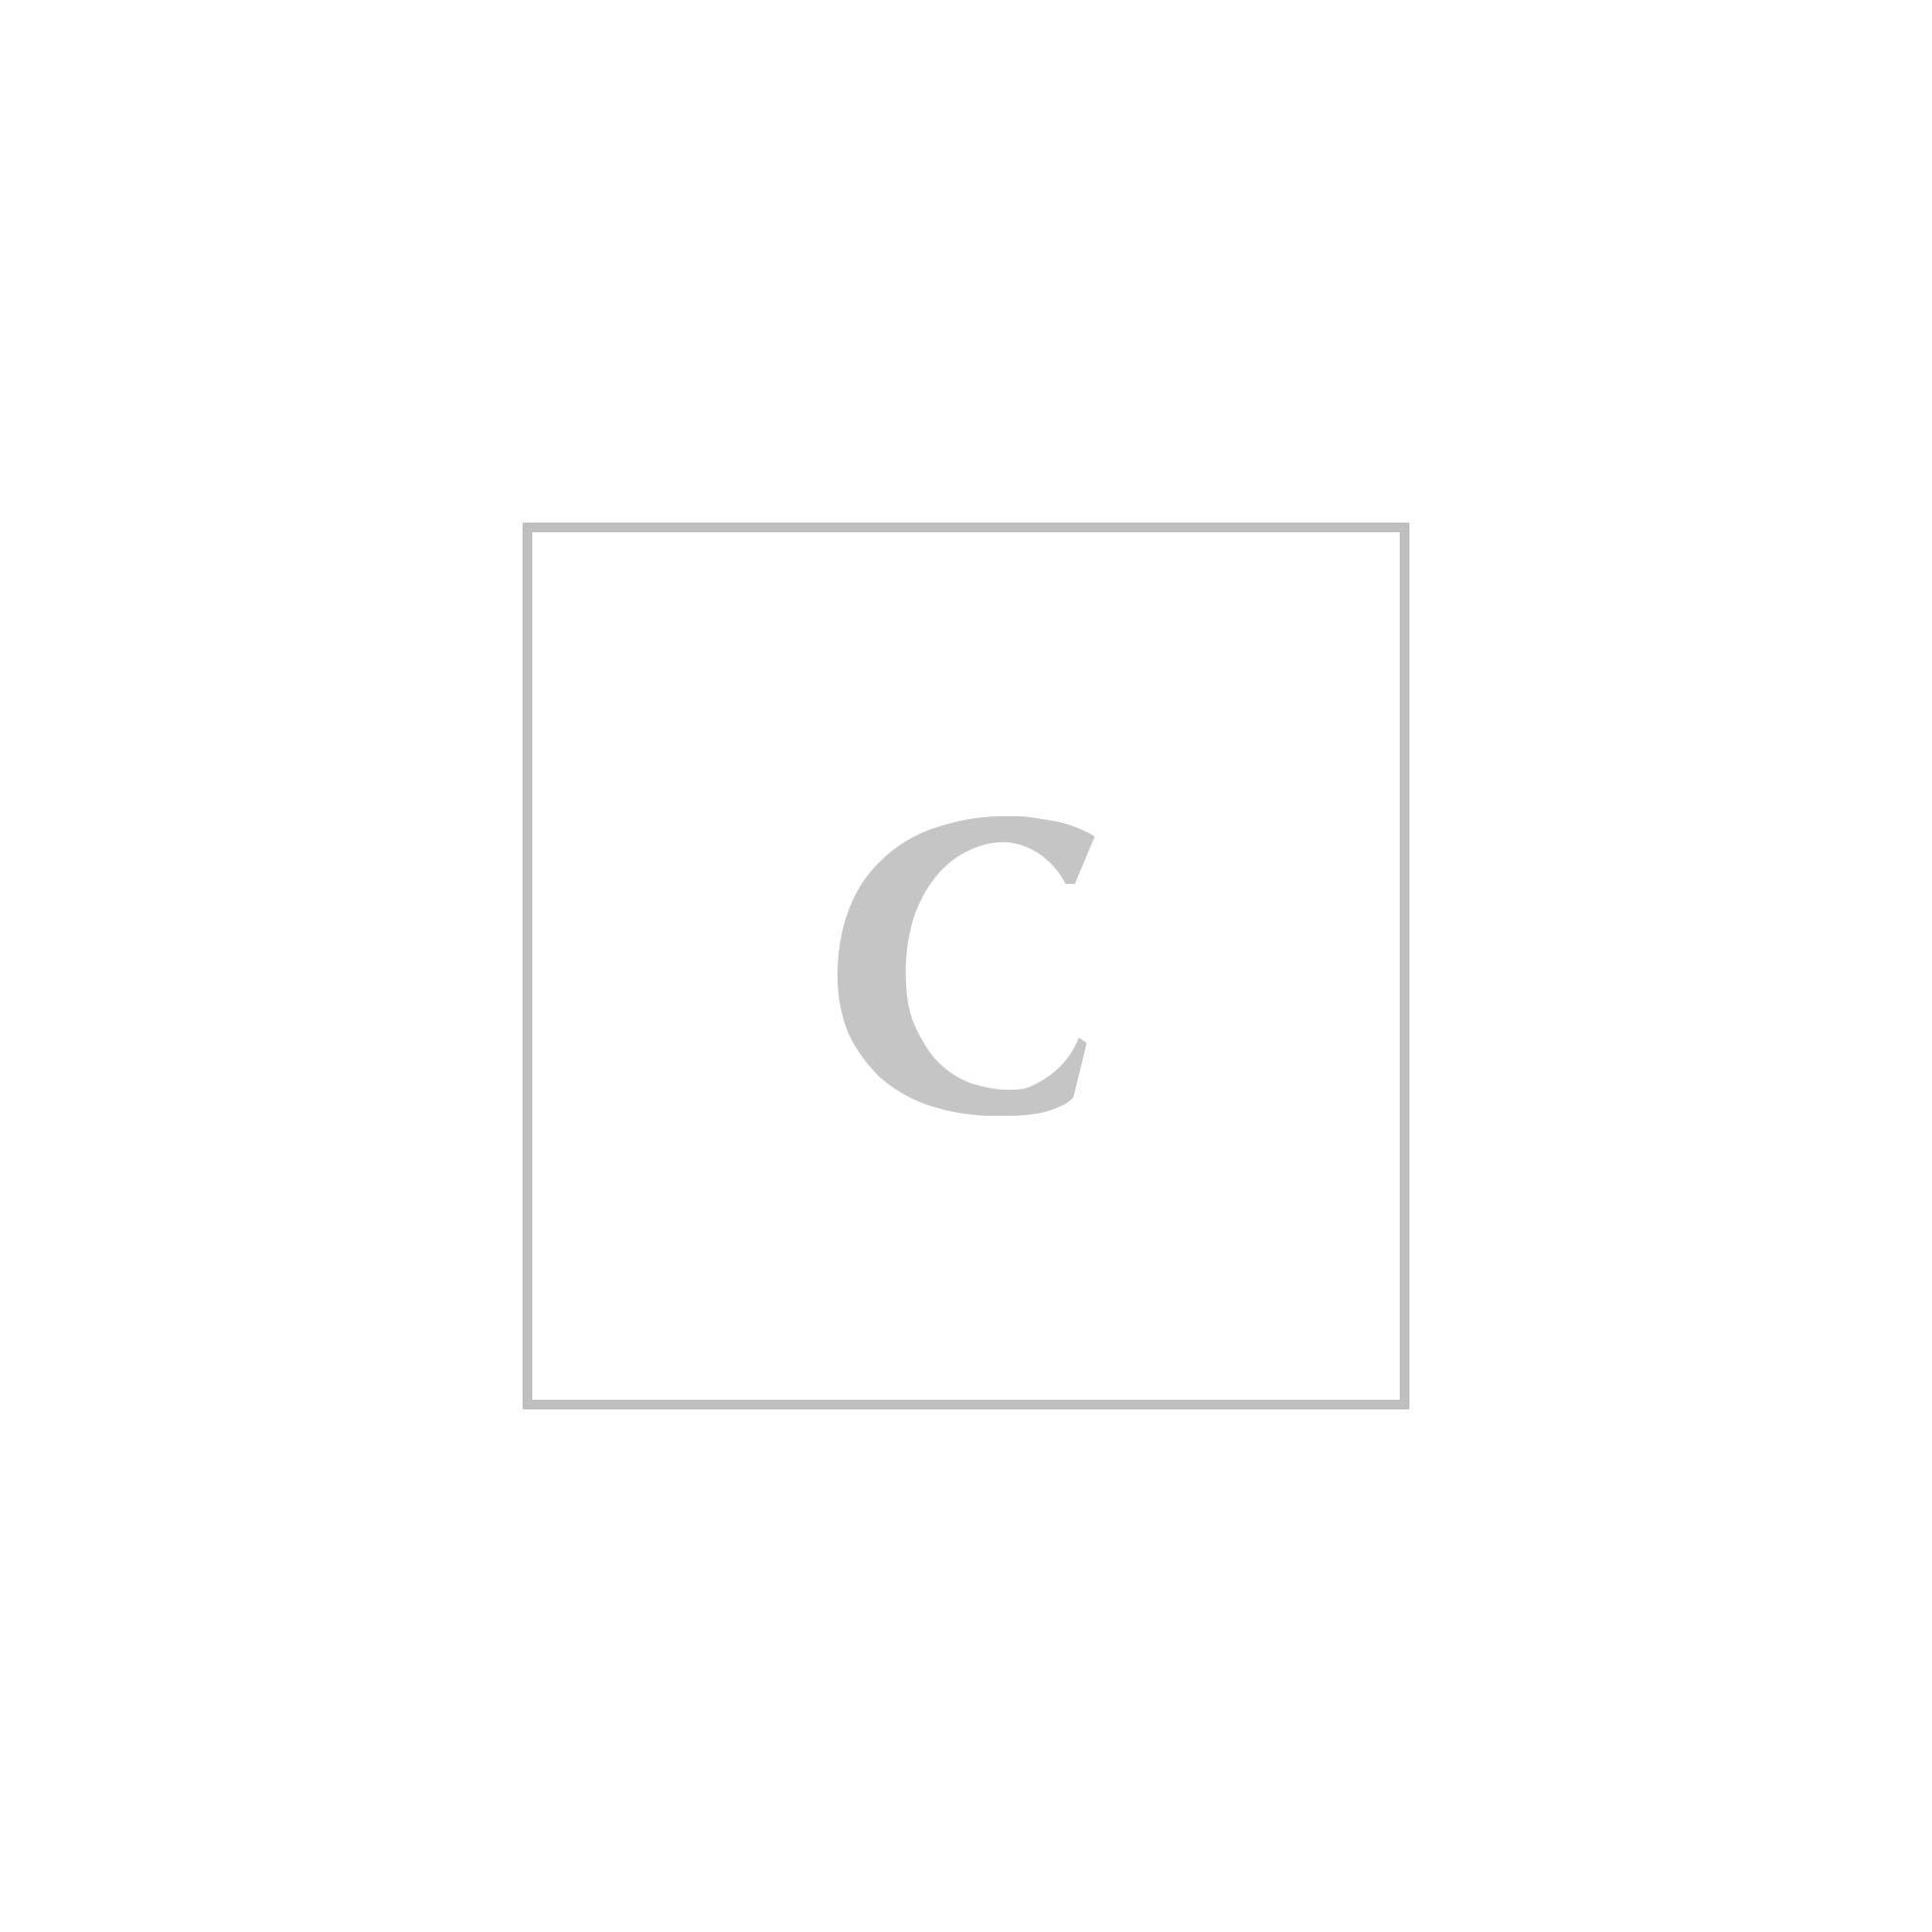 finest selection c519b 5add5 Moncler Basic Piumini da Donna Rosso